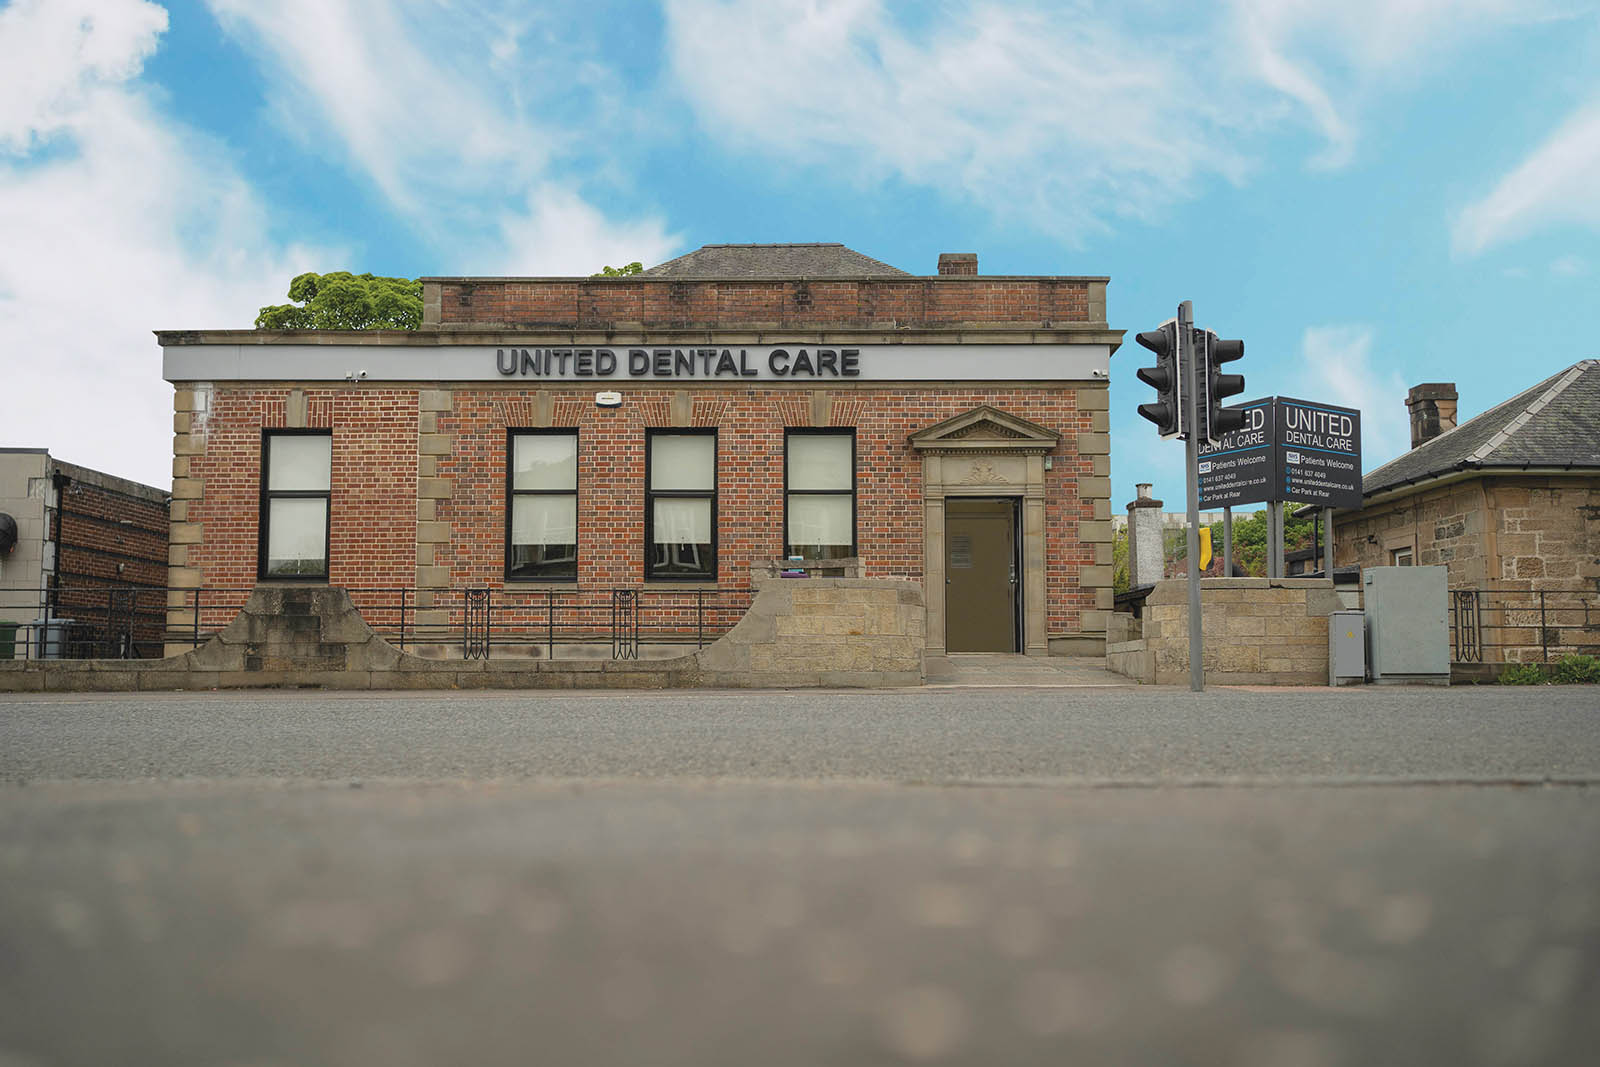 United Dental Care